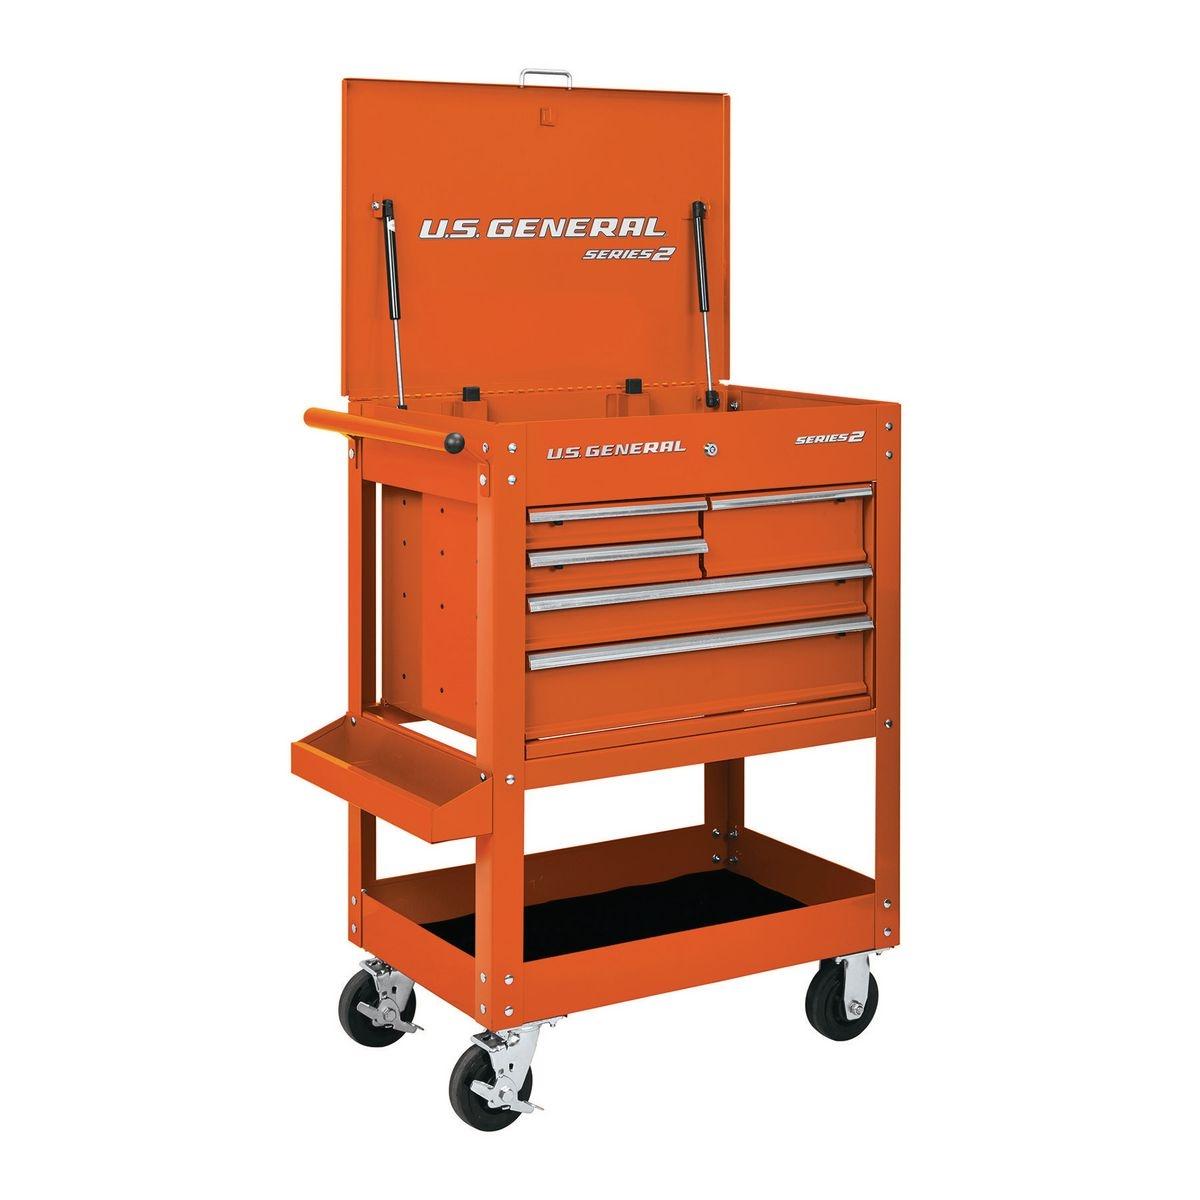 U.S. GENERAL 30 In. 5 Drawer Mechanic's Cart - Orange - Item 64722 / 56238